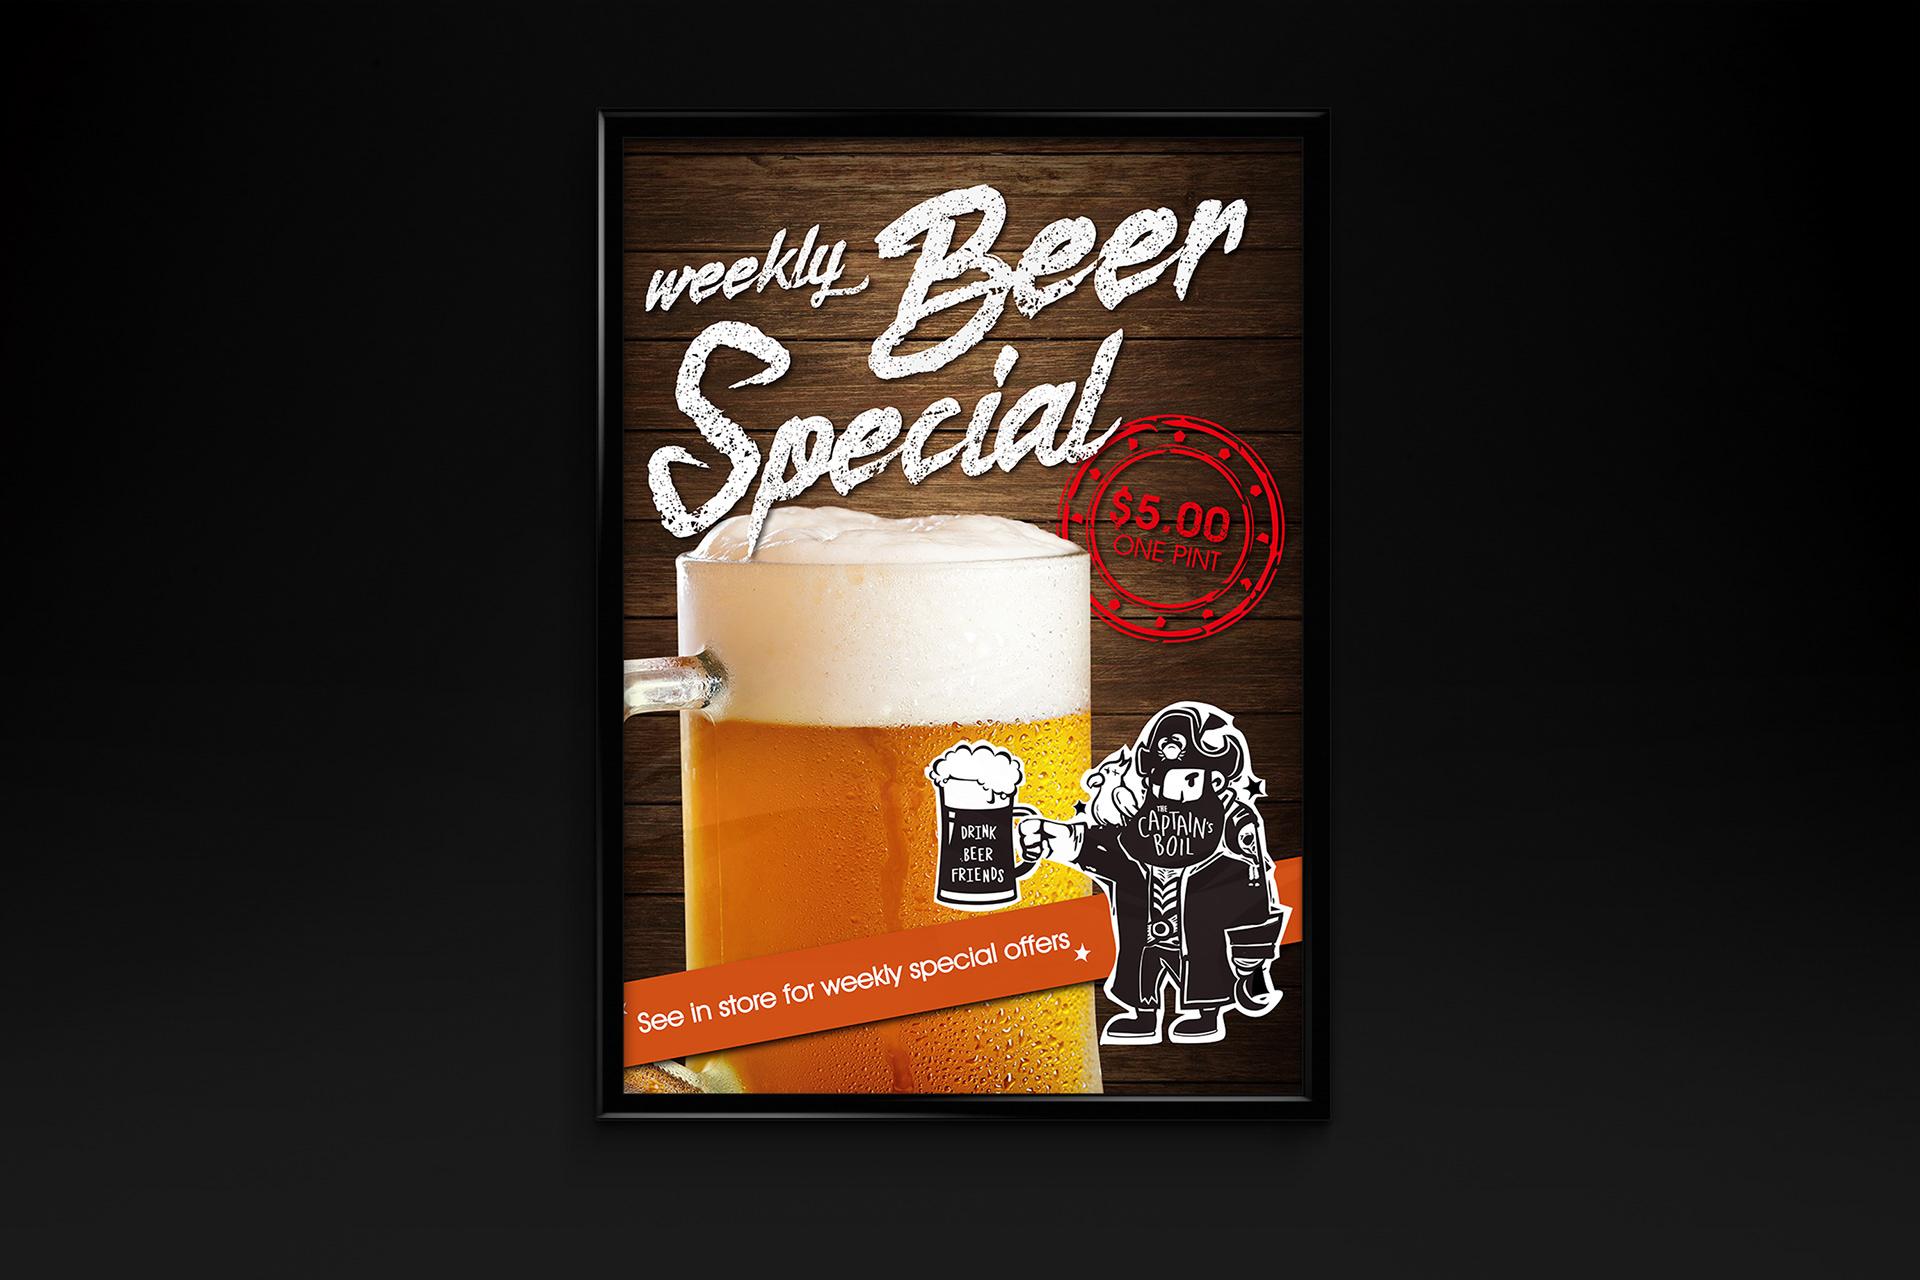 Beer Special Promotion Poster Design For The Captains Boil Restaurant